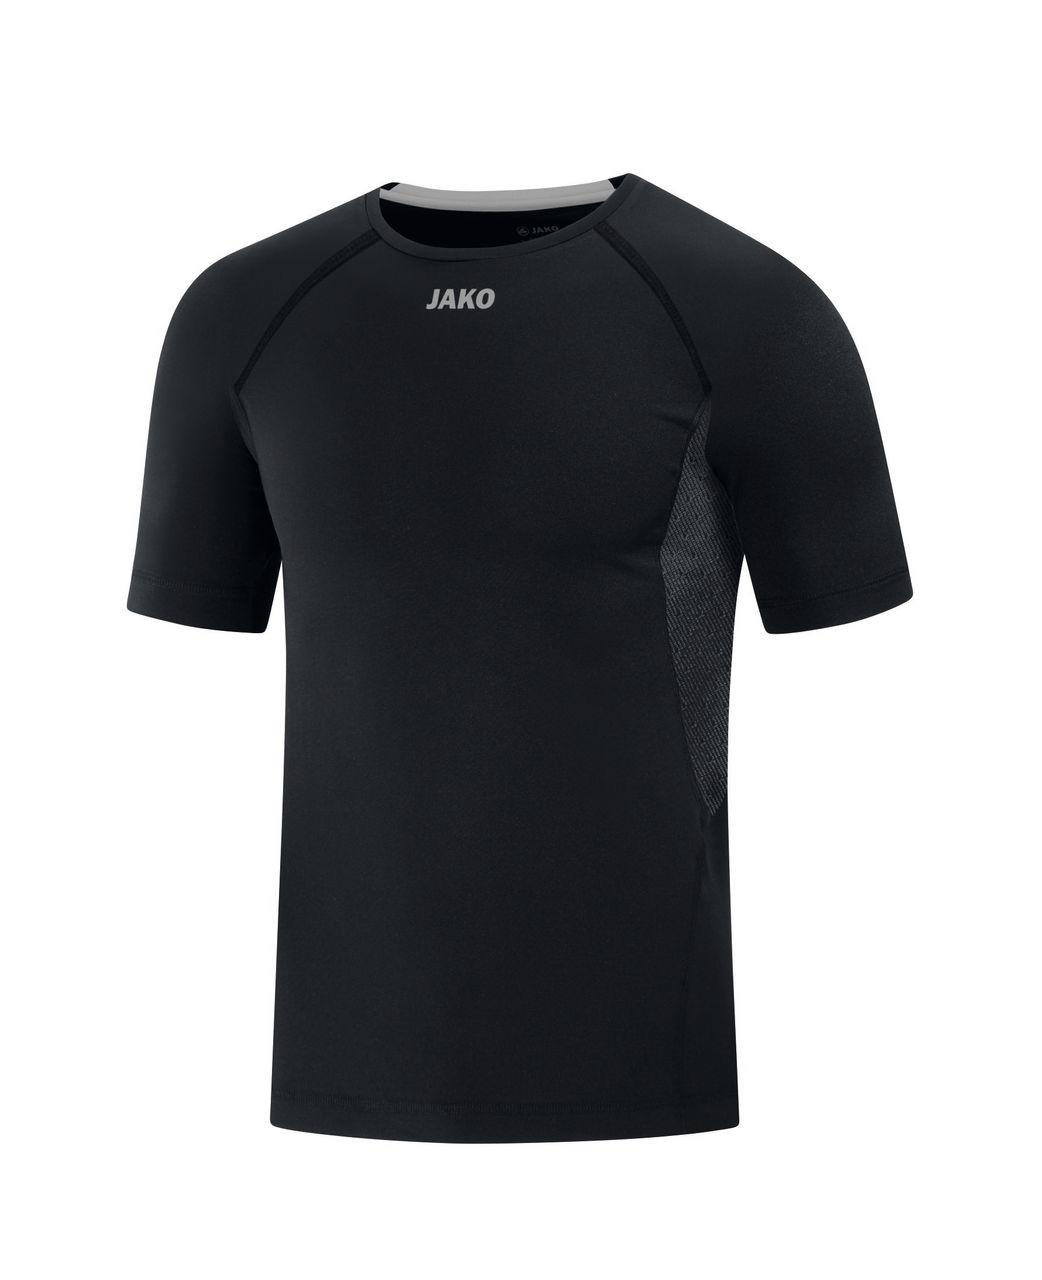 JAKO T-Shirt Compression 2.0